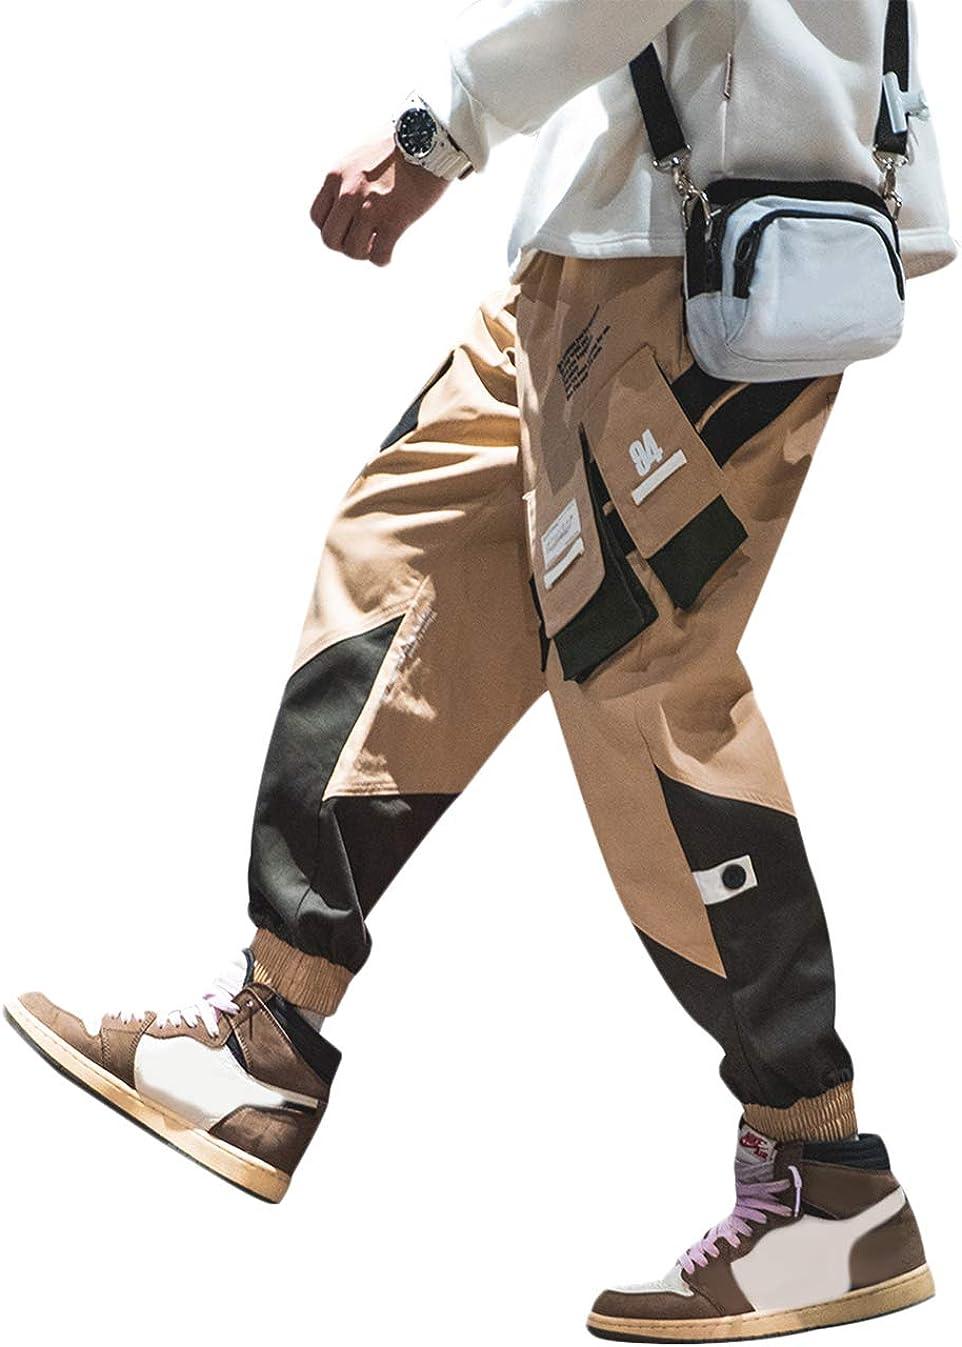 Irypulse Unisex Cargo Pantalones Combate Trousers Multi Bolsillos Flojo Tactico Ropa Calle Pants Para Hombres Mujeres Jovenes Otono Invierno Pantalones Ropa